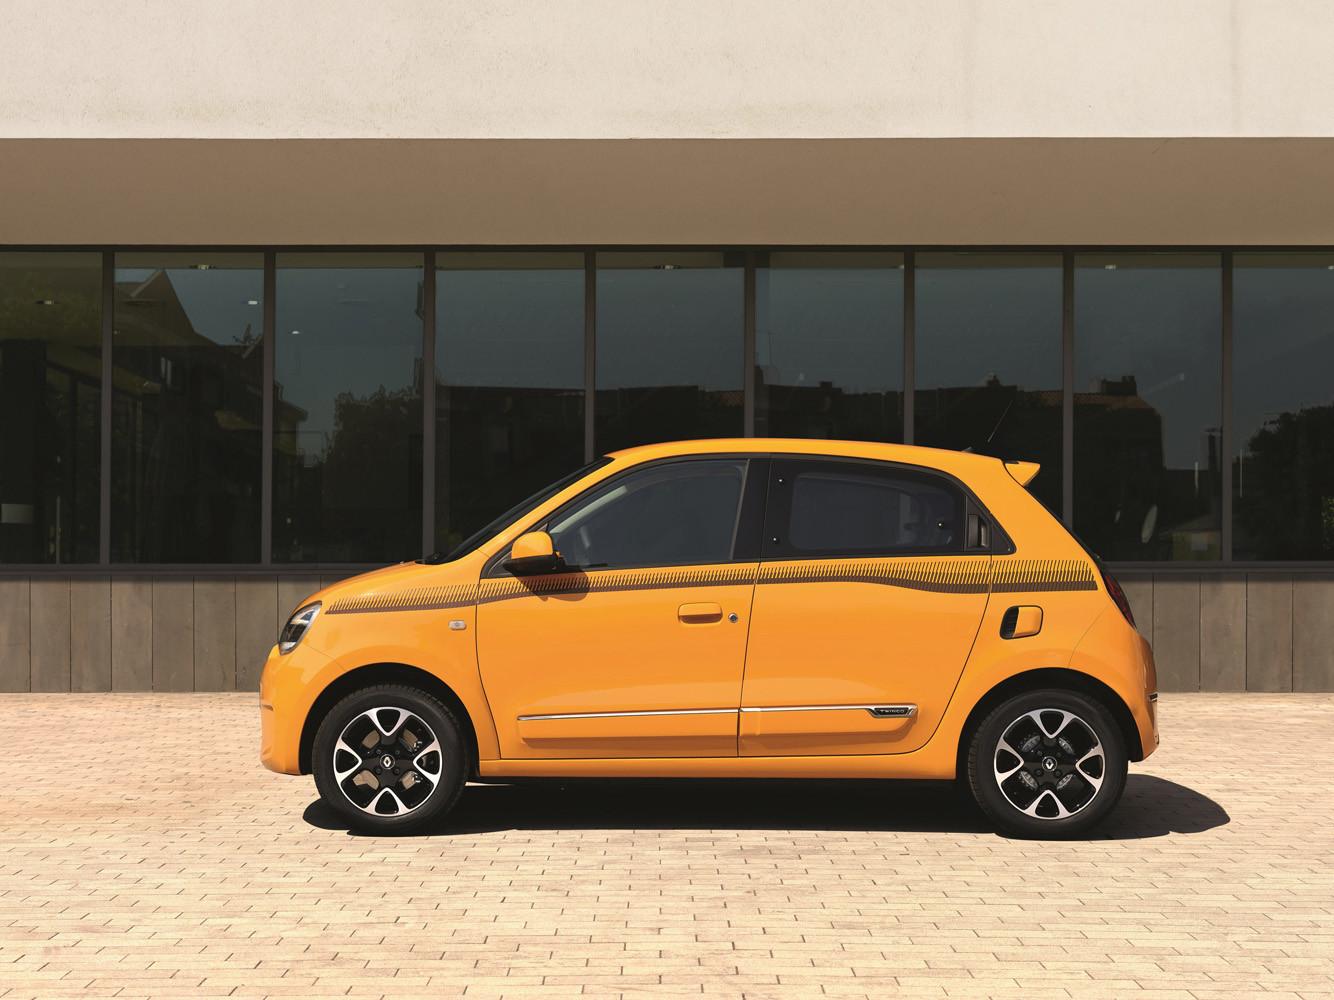 Foto de Renault Twingo 2019 (39/43)